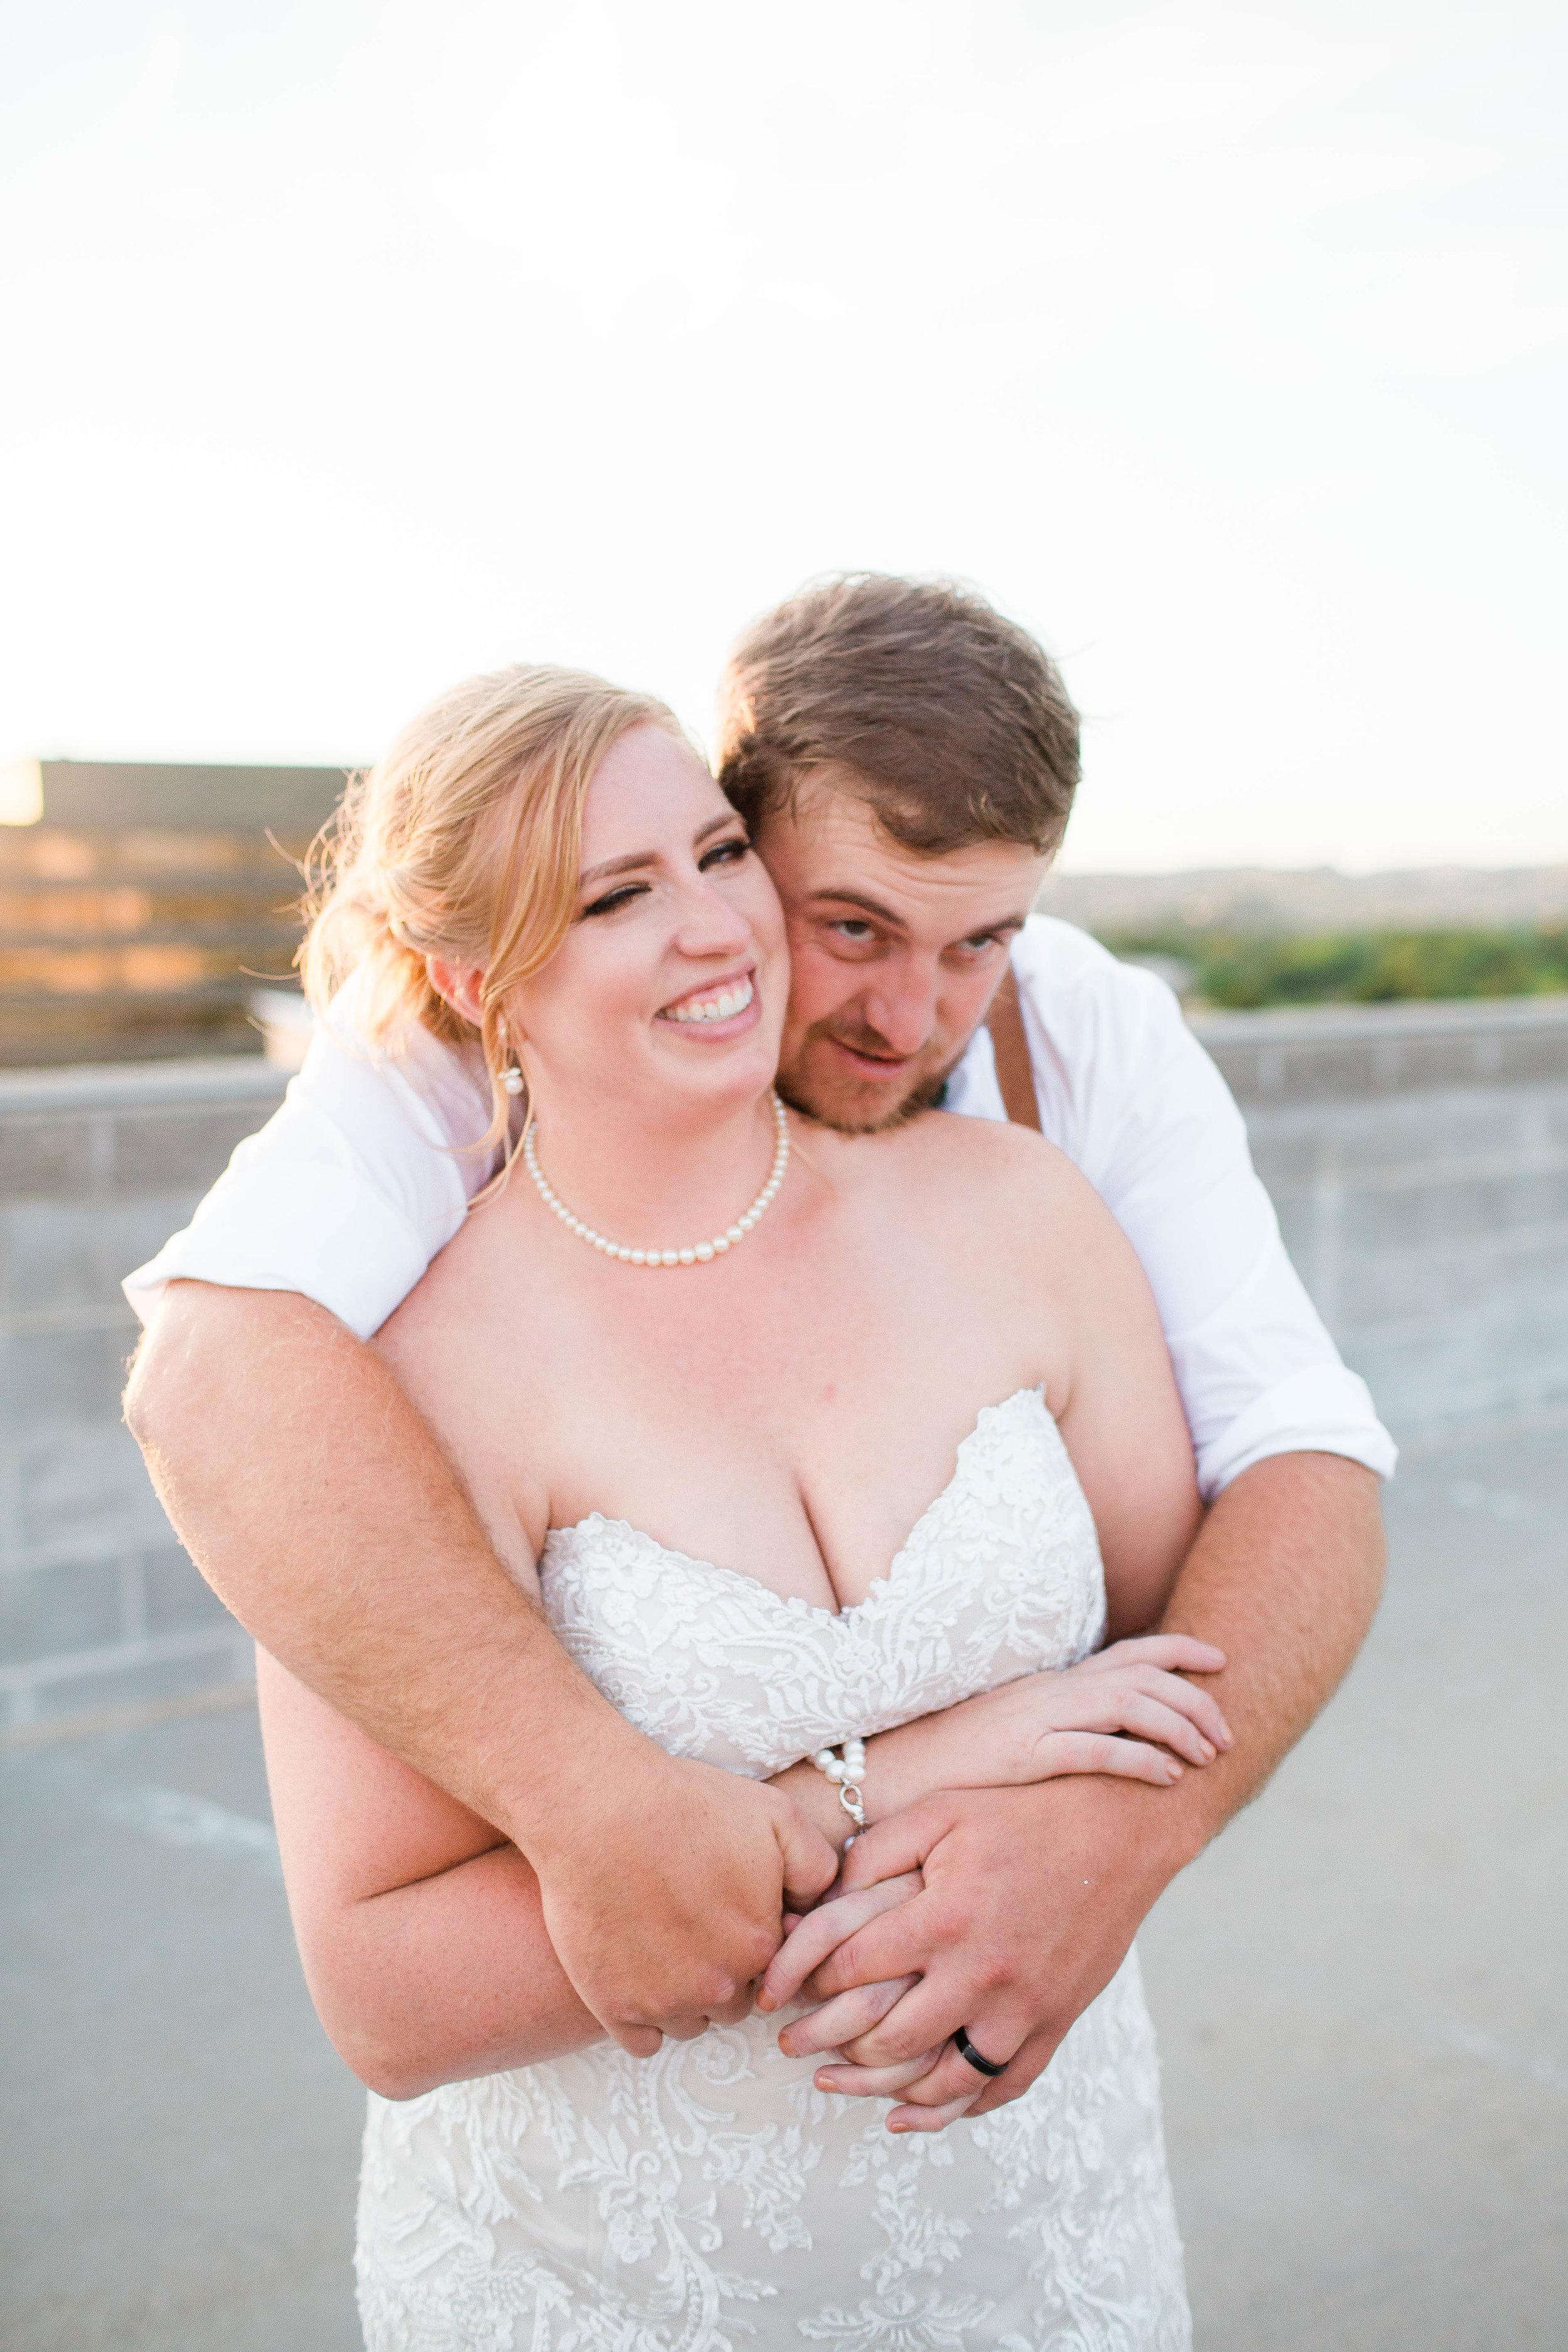 E-Lydia-Rohan-Downtown-Boise-Wedding-11.jpg